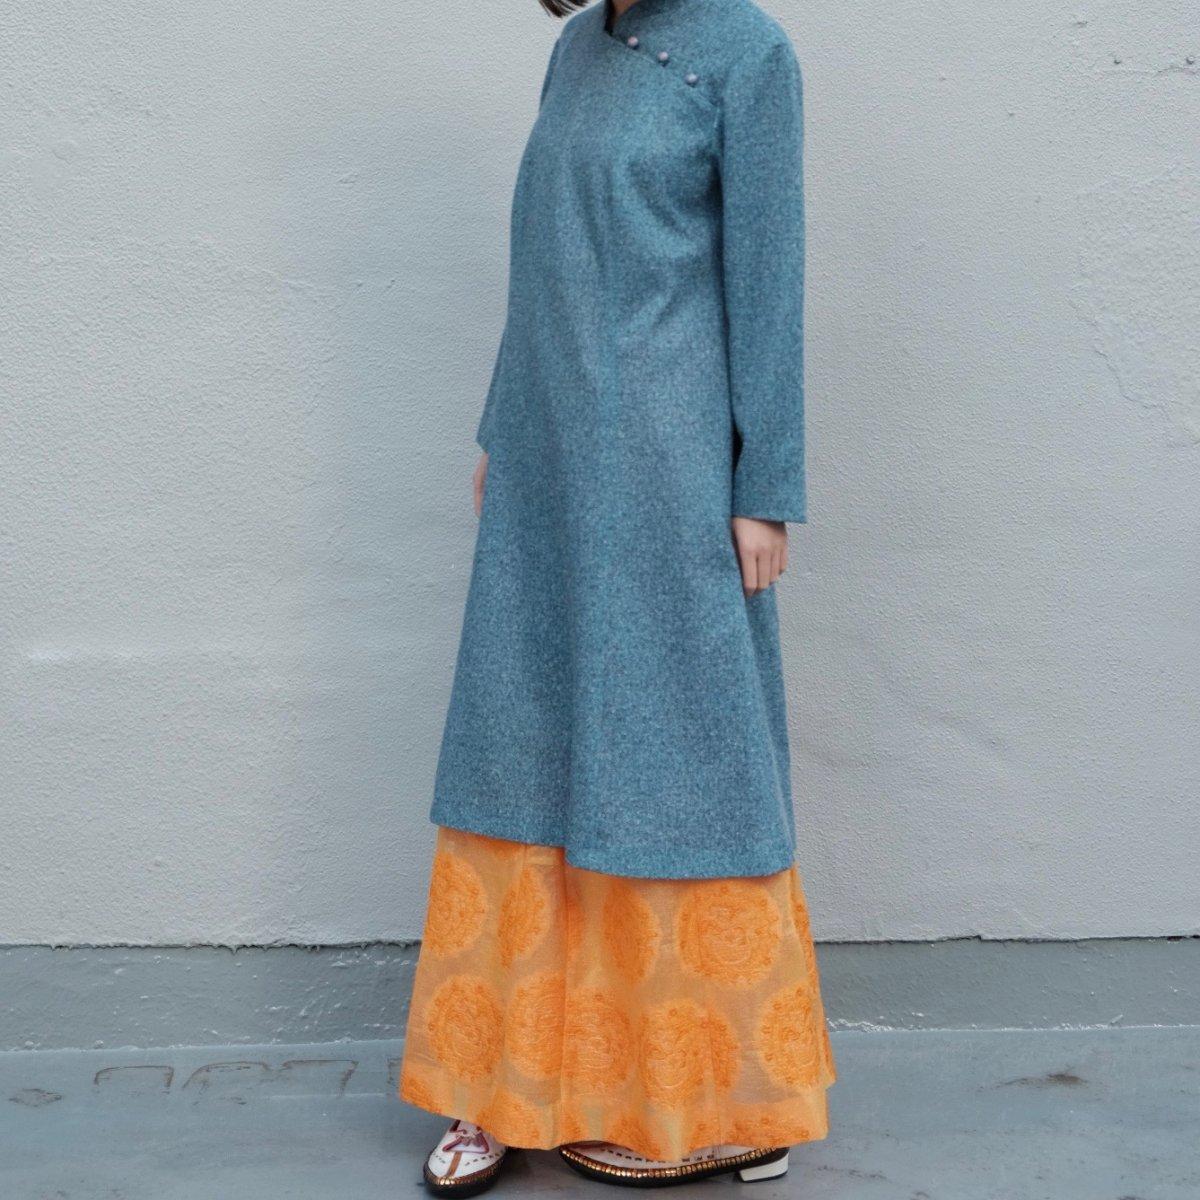 [VINTAGE] Tangerine Orange Maxi Skirt